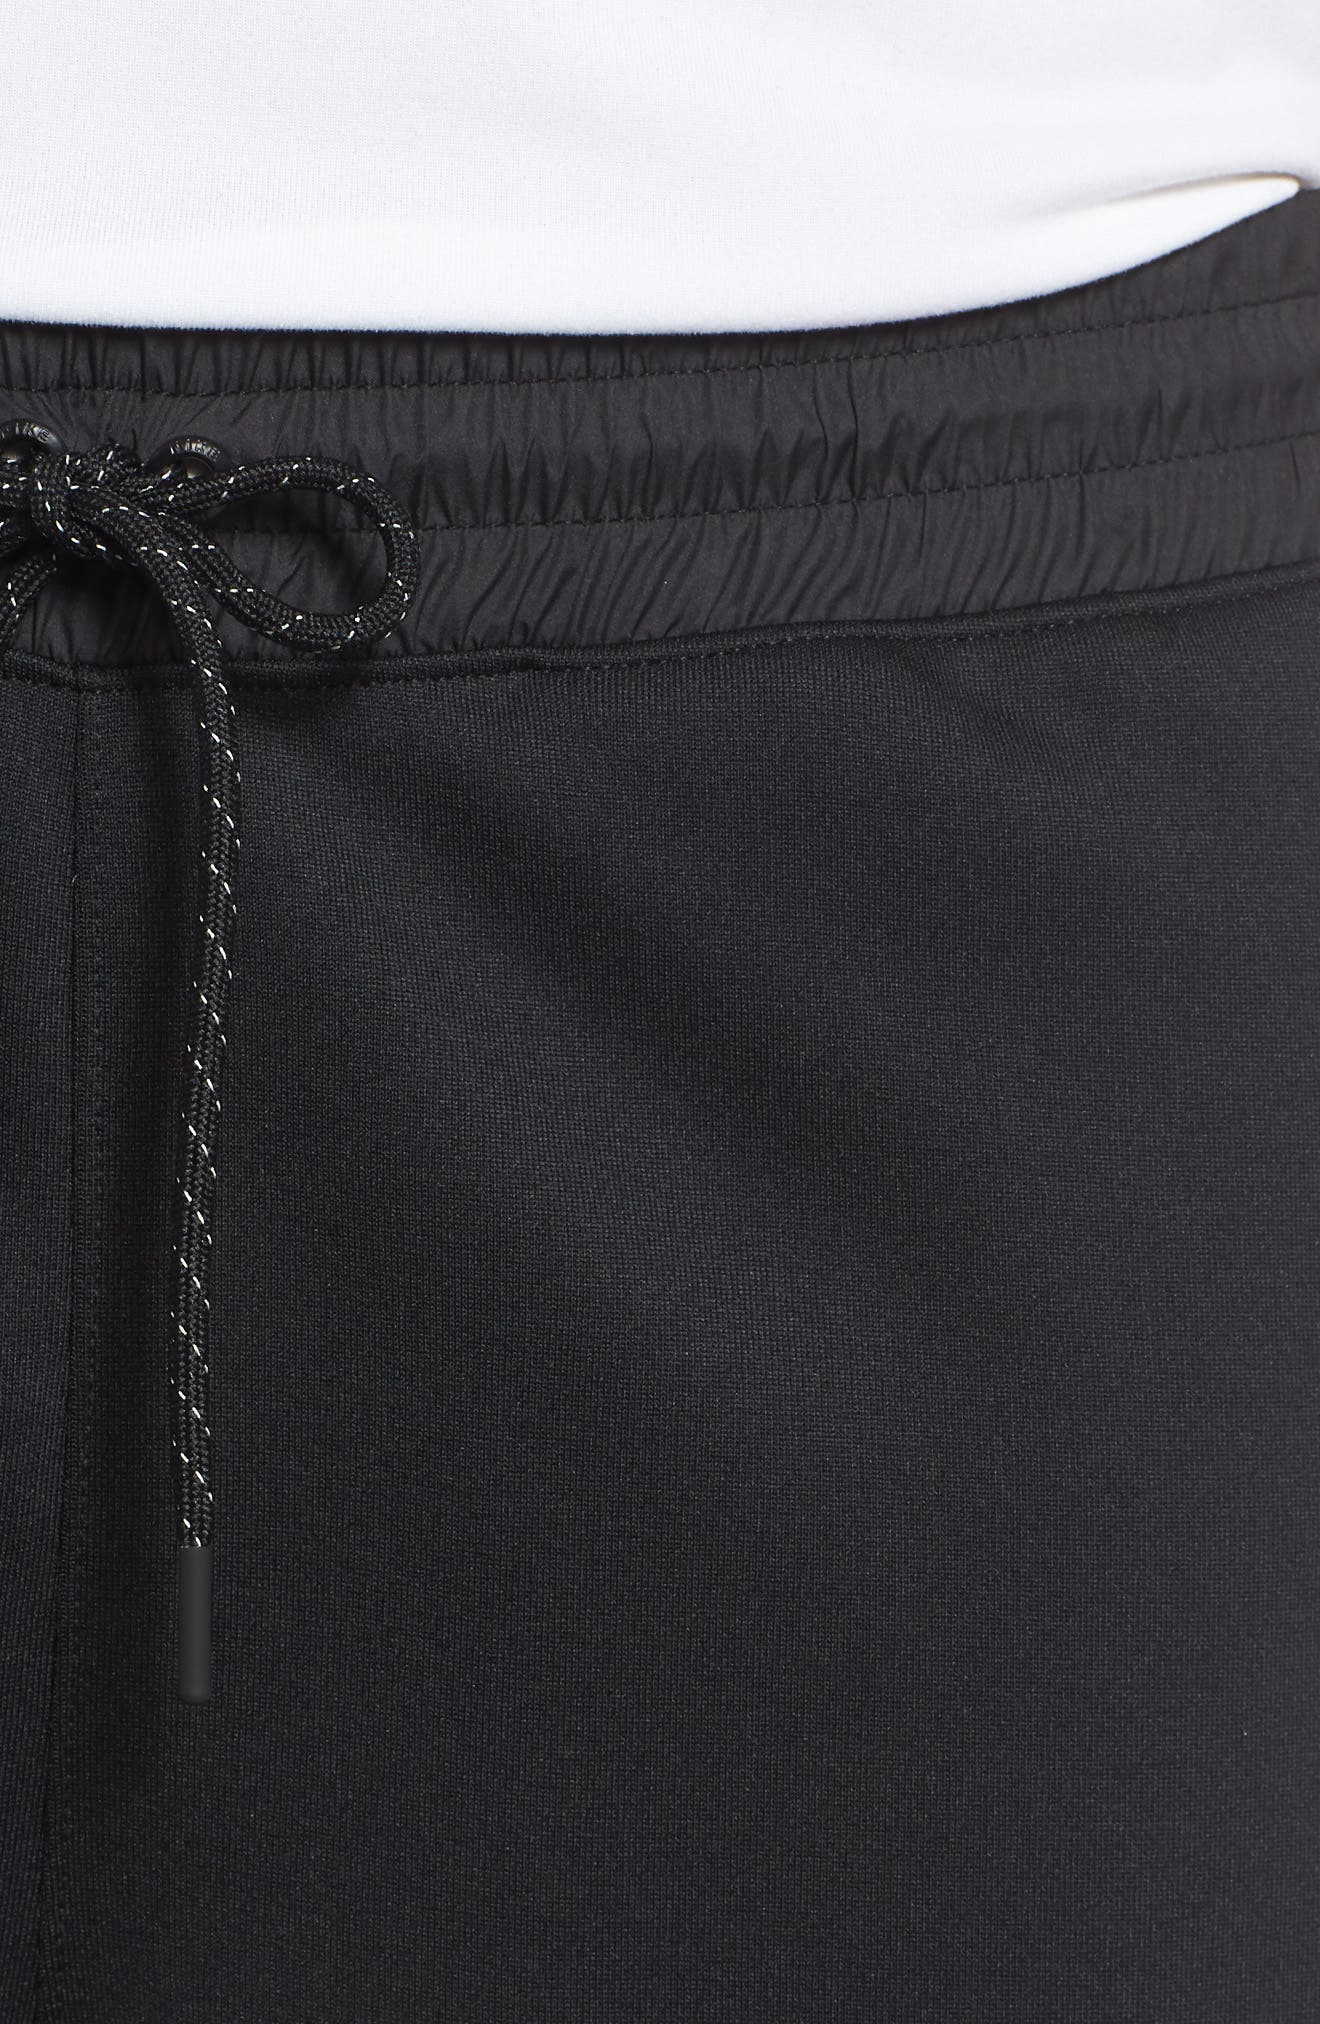 Sportswear Air Max Shorts,                             Alternate thumbnail 4, color,                             010